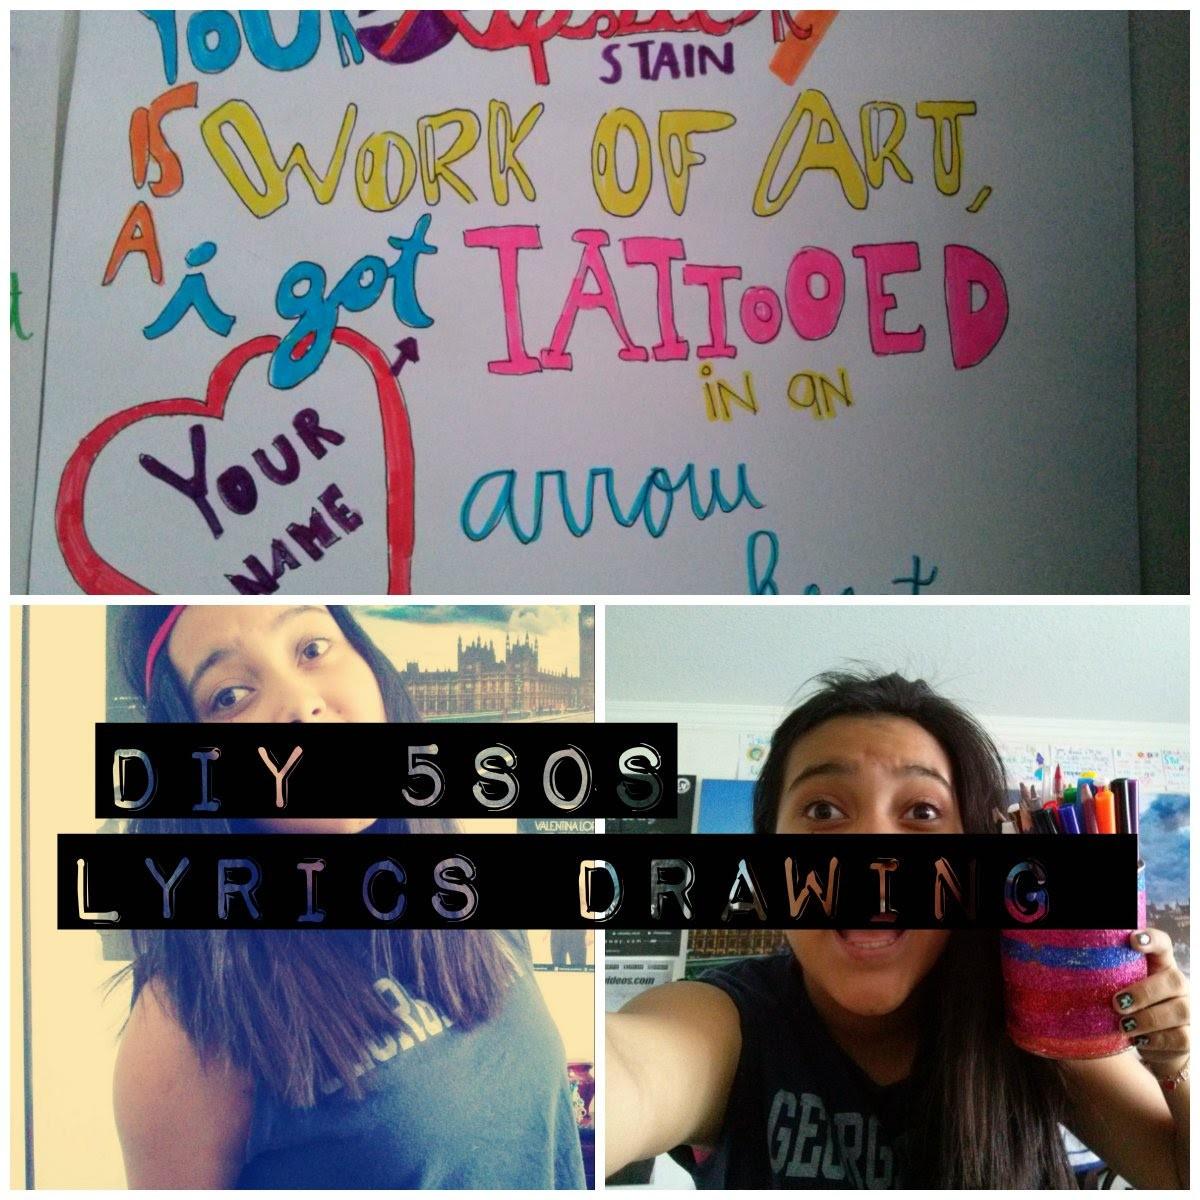 DIY 5SOS Lyrics Drawing, She looks so perfect